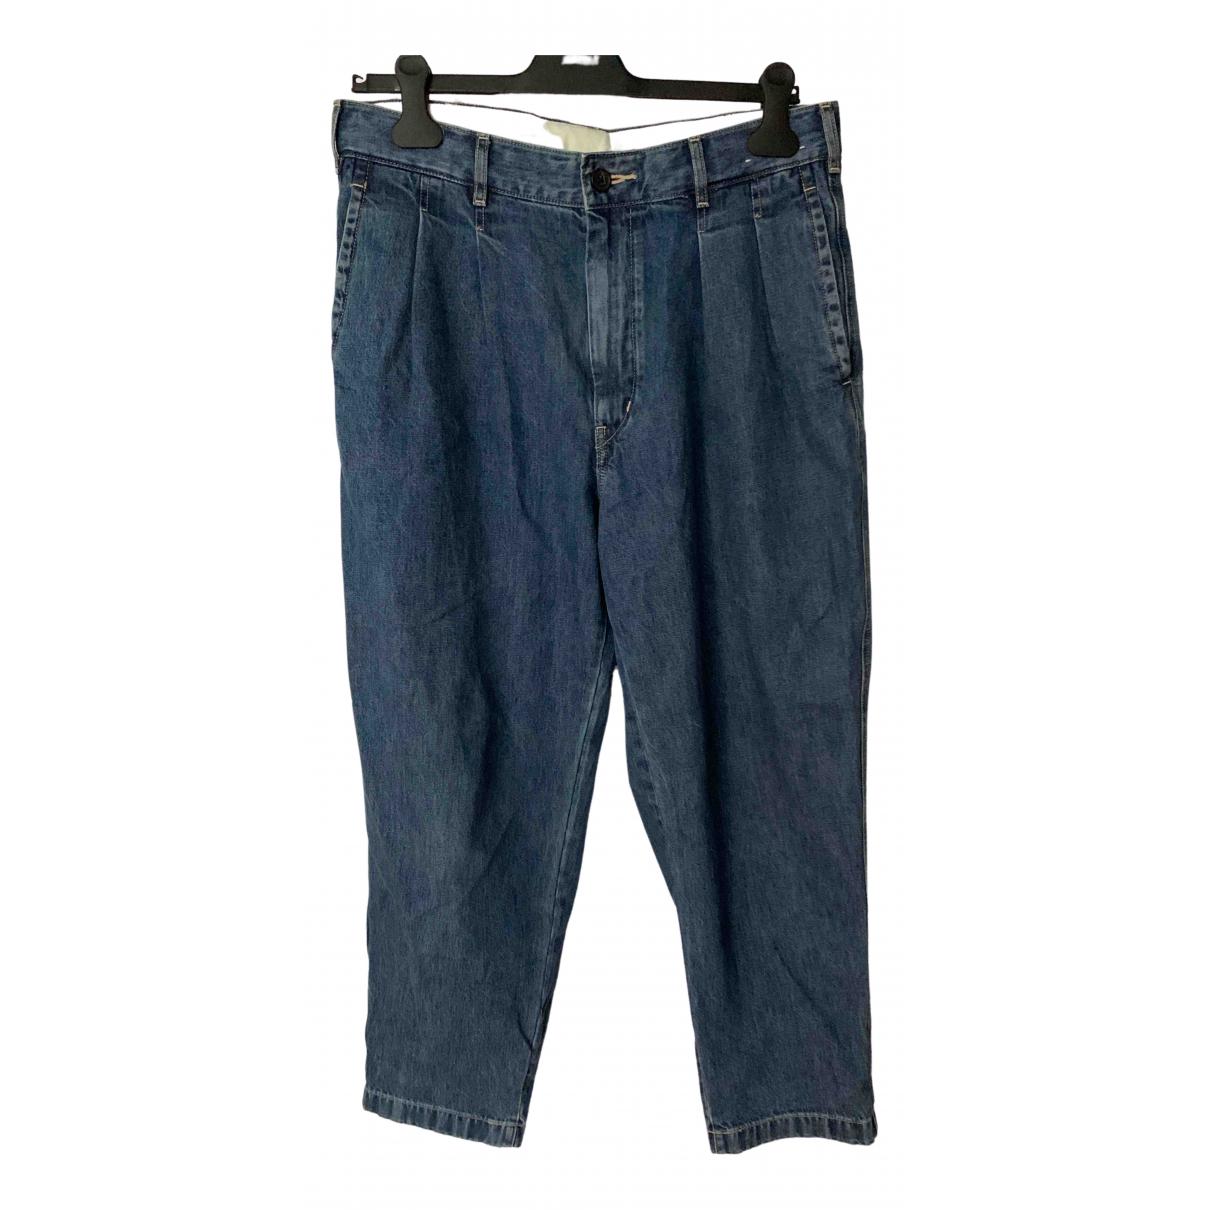 Uniqlo \N Blue Denim - Jeans Trousers for Men 32 UK - US